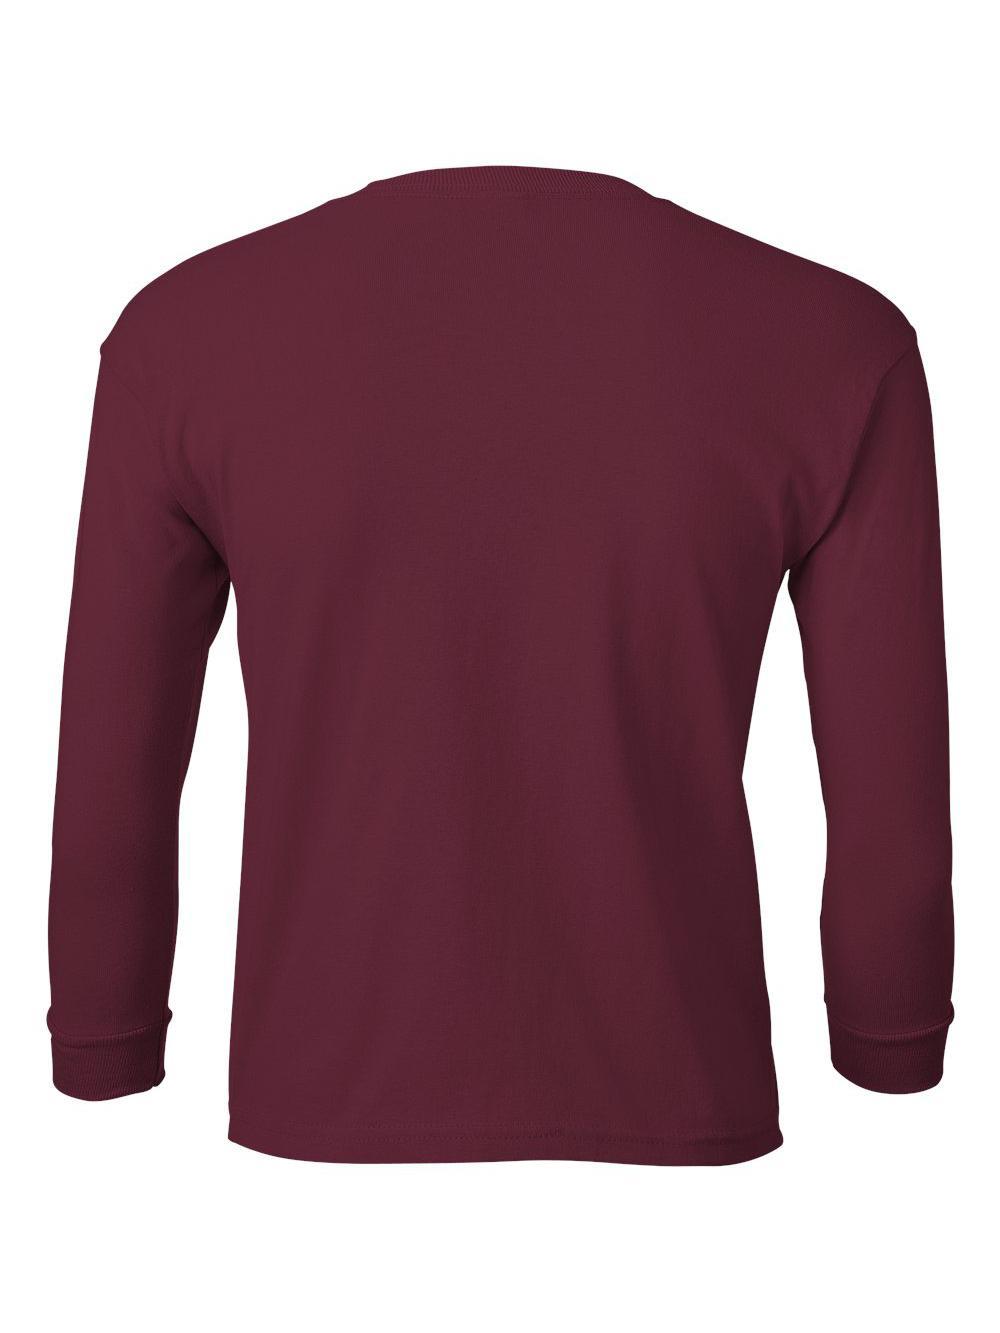 Gildan-Ultra-Cotton-Youth-Long-Sleeve-T-Shirt-2400B thumbnail 22